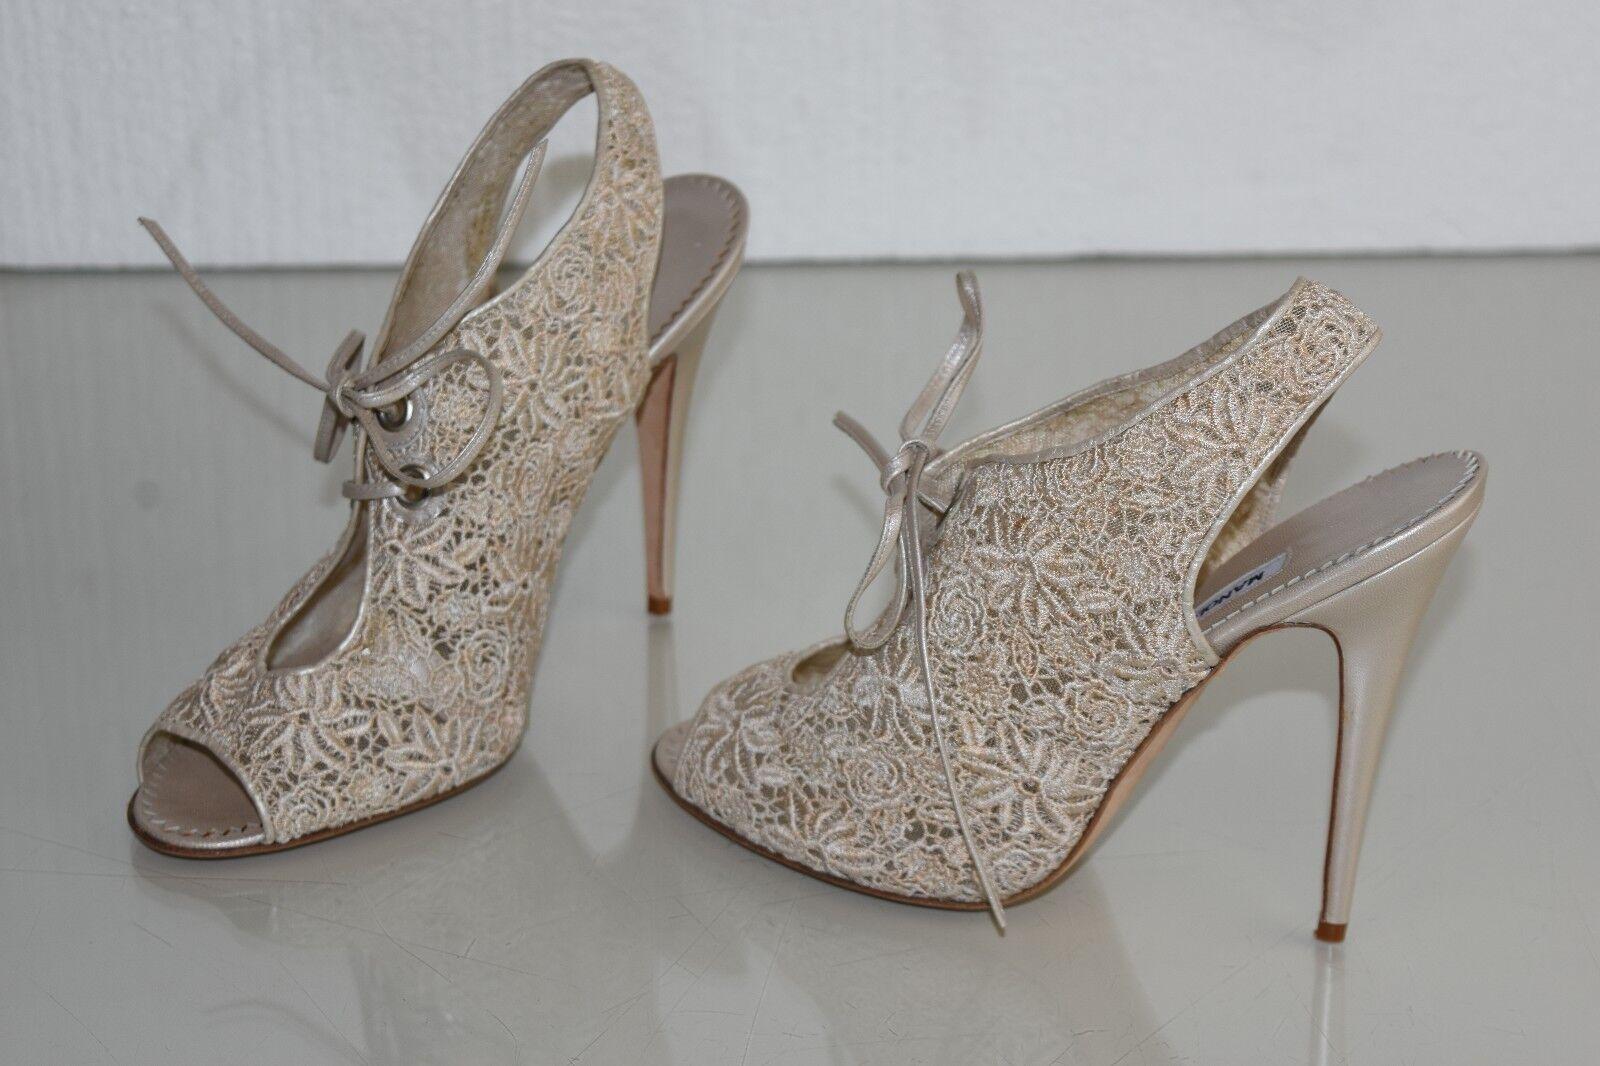 Neu Manolo Blahnik Perle Elfenbein Spitze Sandalen Stiefeletten Schuhe Schuhe Schuhe 39.5 b36cc8